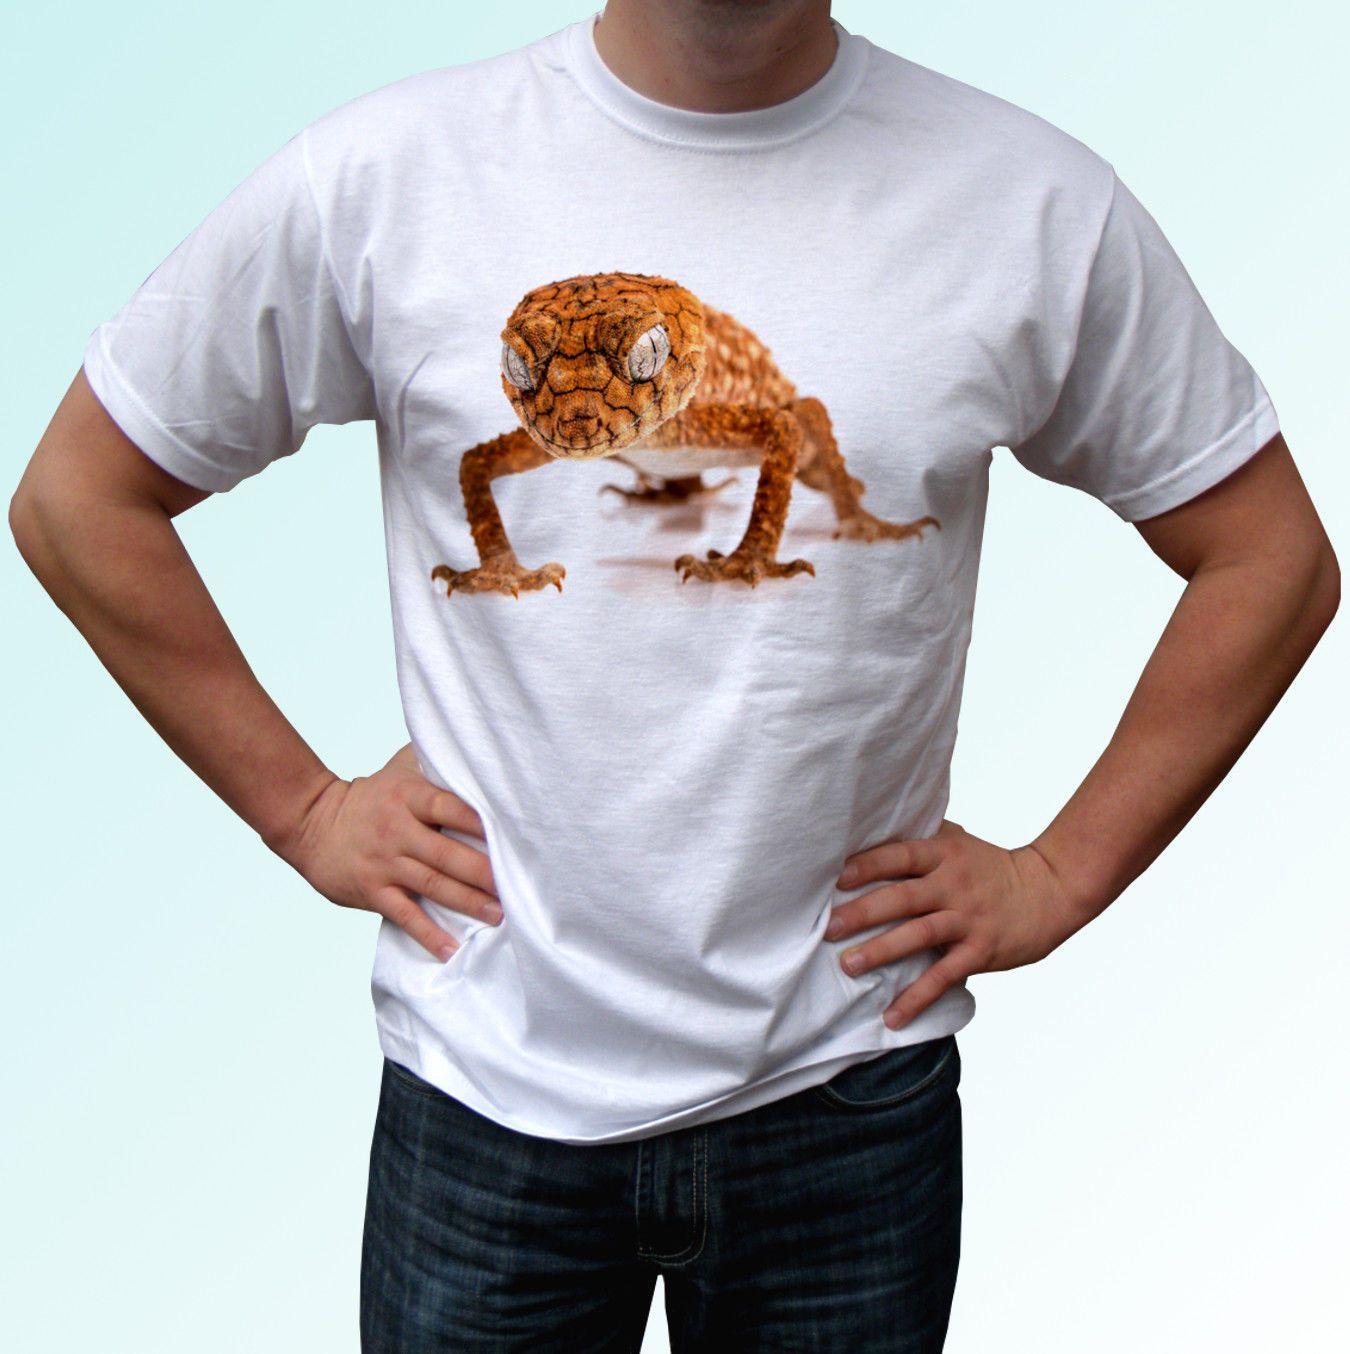 c94cc317 Gecko White T Shirt Lizard Animal Tee Top Design - Mens Womens Kids Baby  Cool Casual Pride T Shirt Men Unisex New Fashion